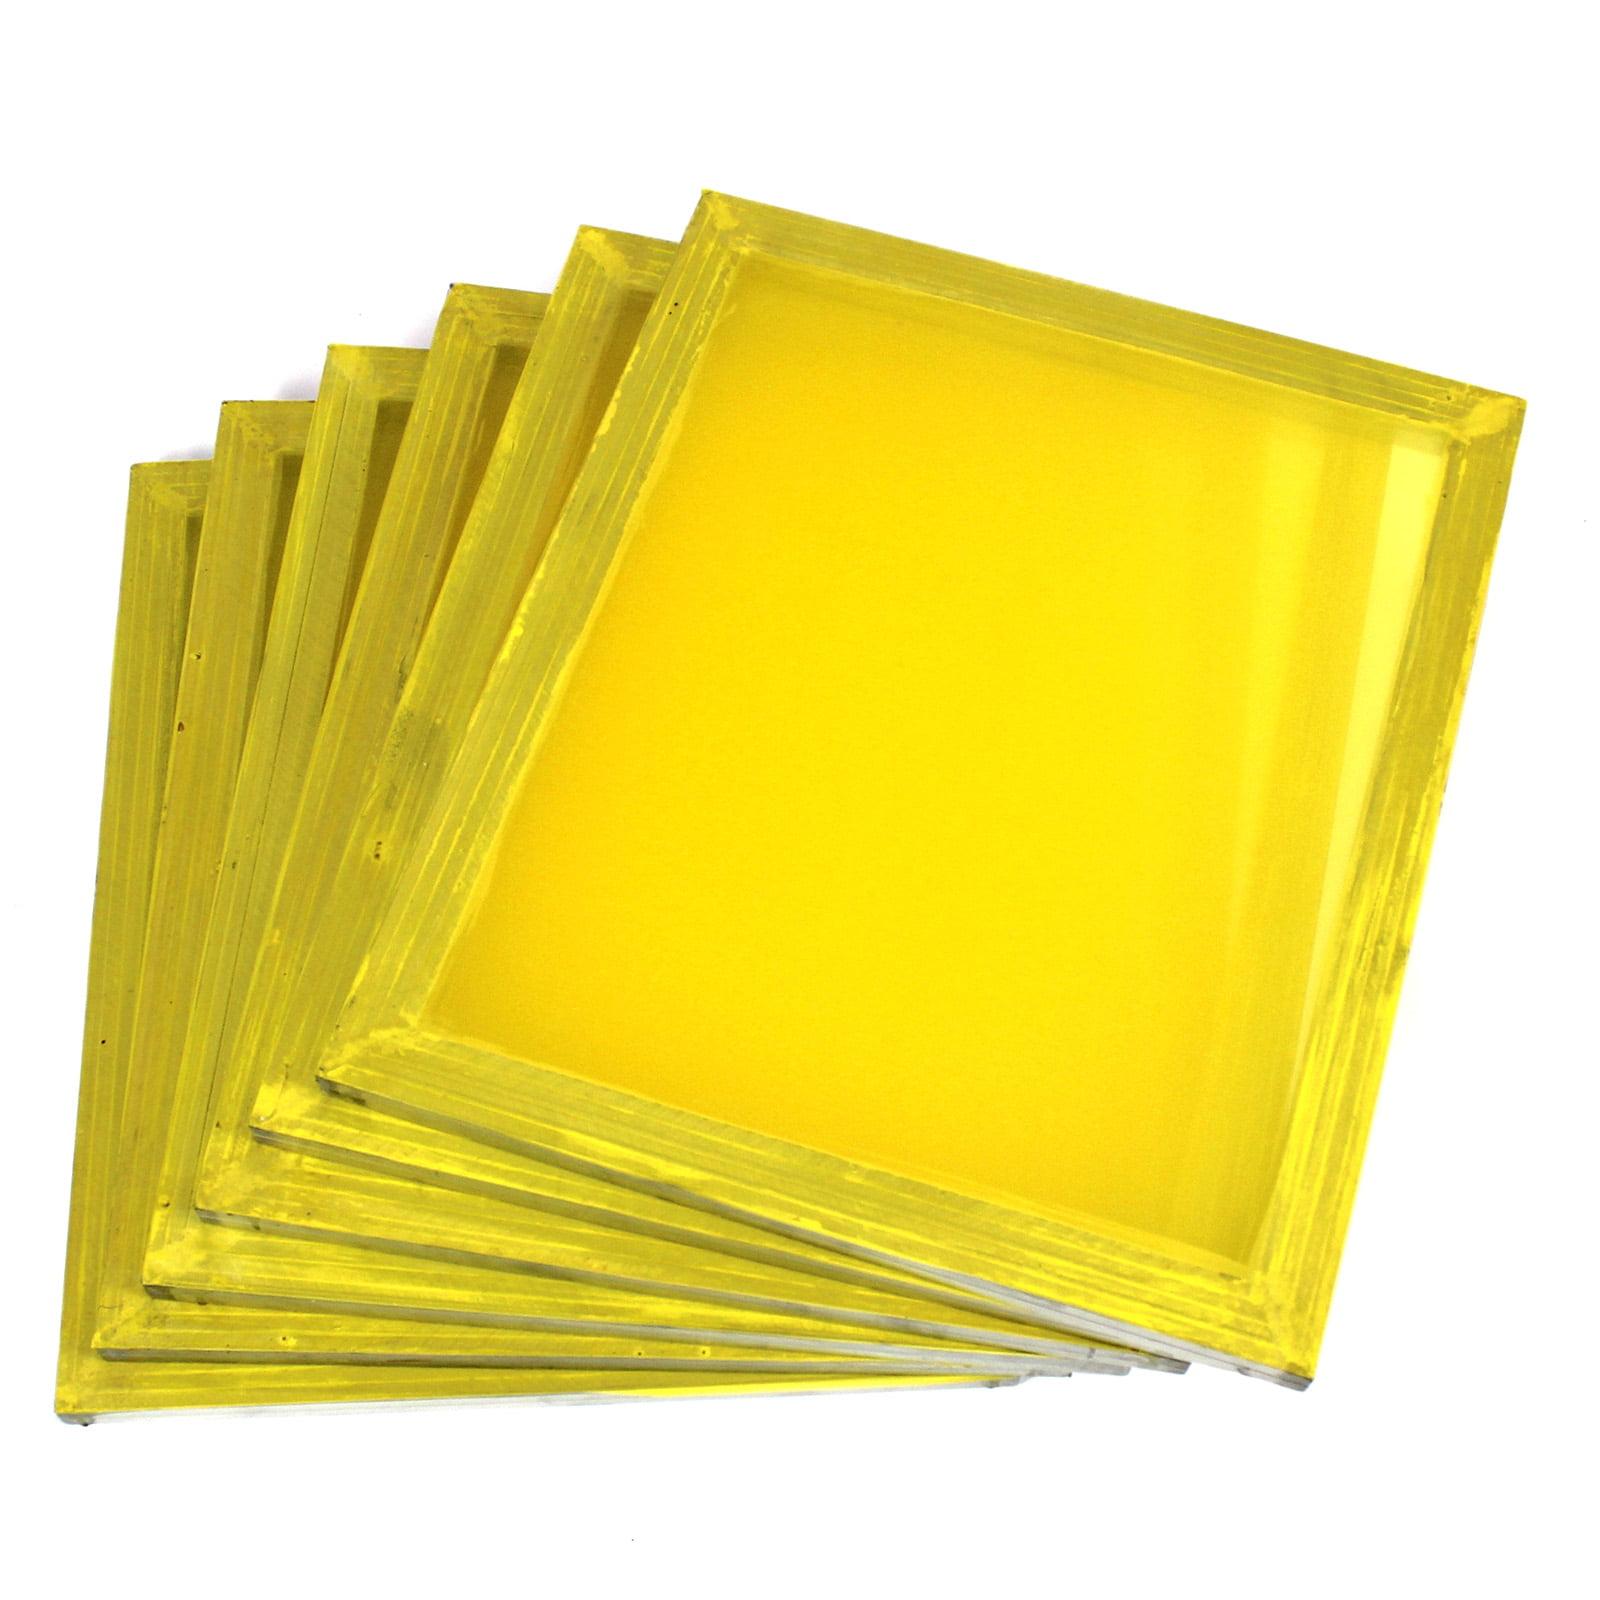 "6 Aluminum Silk Screen Printing Press Screens 355 TPI Yellow Mesh 20""x24"""